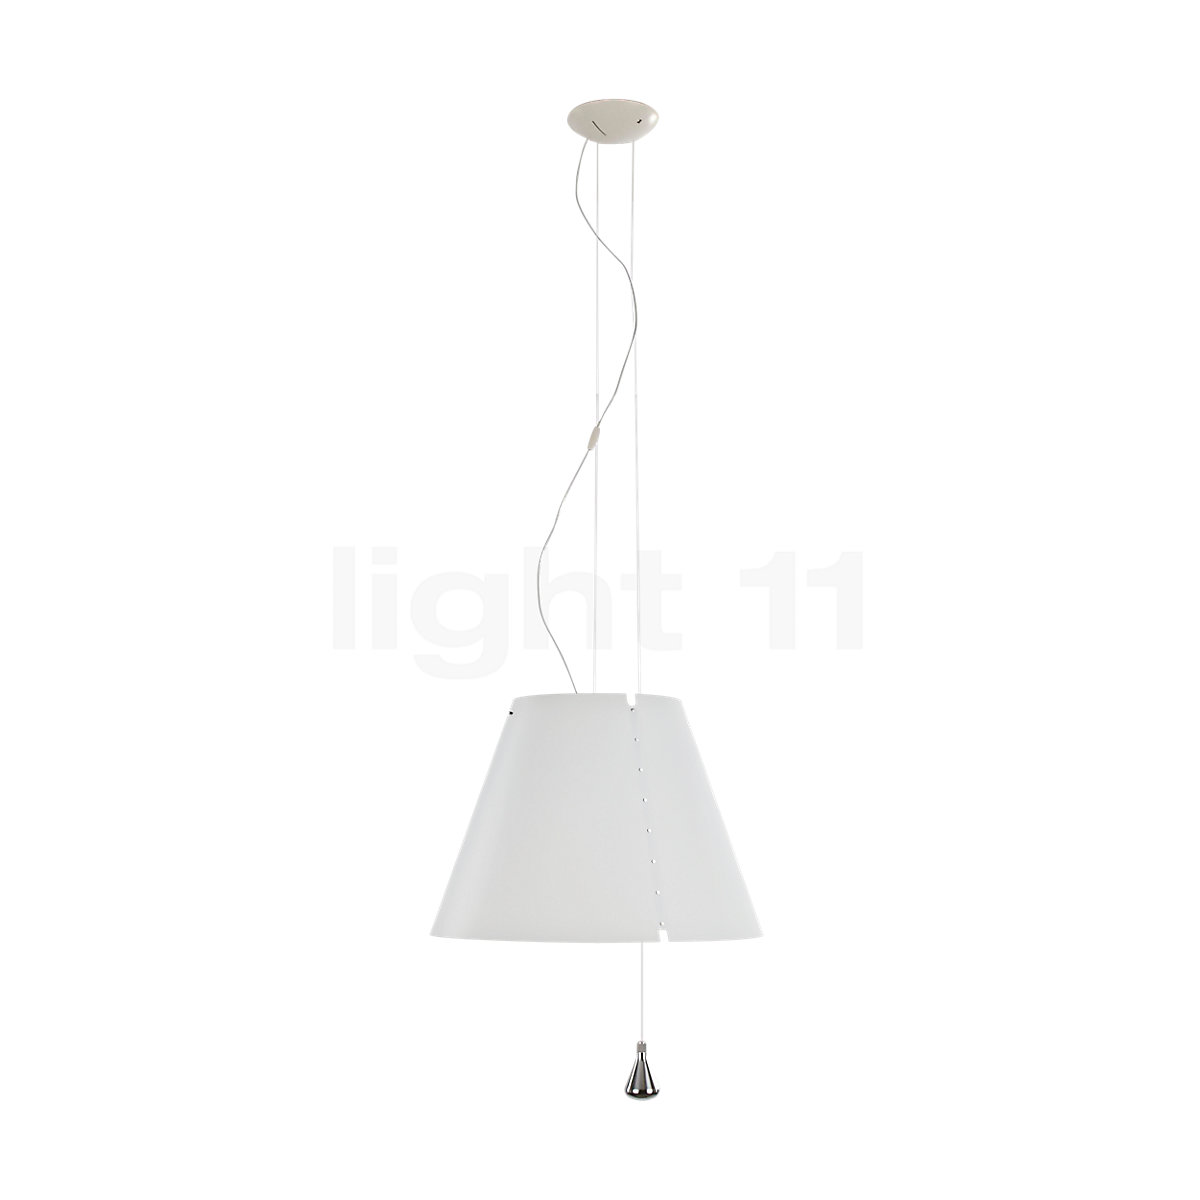 Costanza Luceplan Sospensione.Buy Luceplan Costanza Sospensione Adjustable At Light11 Eu